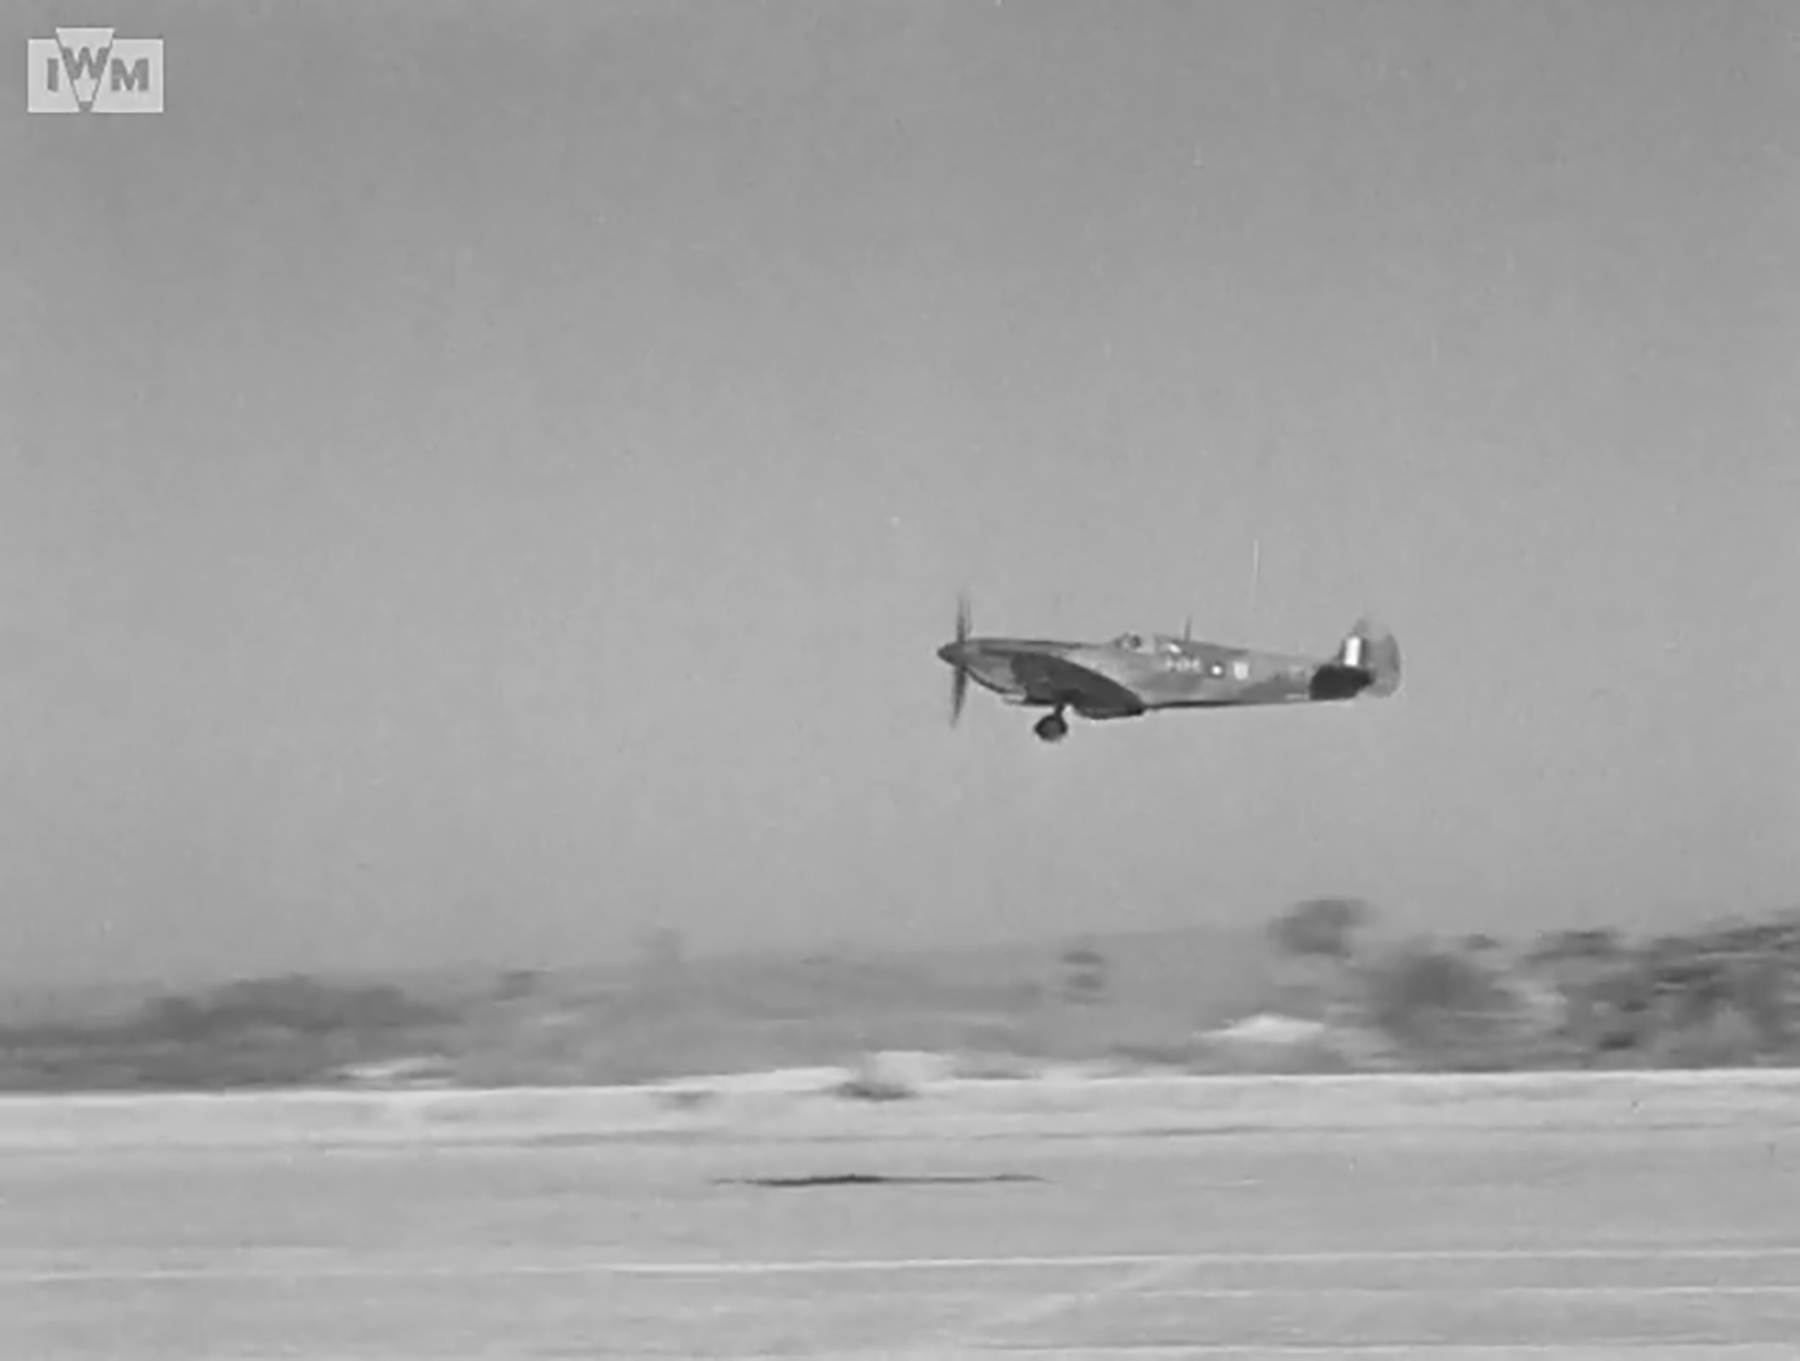 Spitfire VIII RAF 136Sqn HM taking off from Rumkhapalong operating over Burma CBI 1944 IWM 01